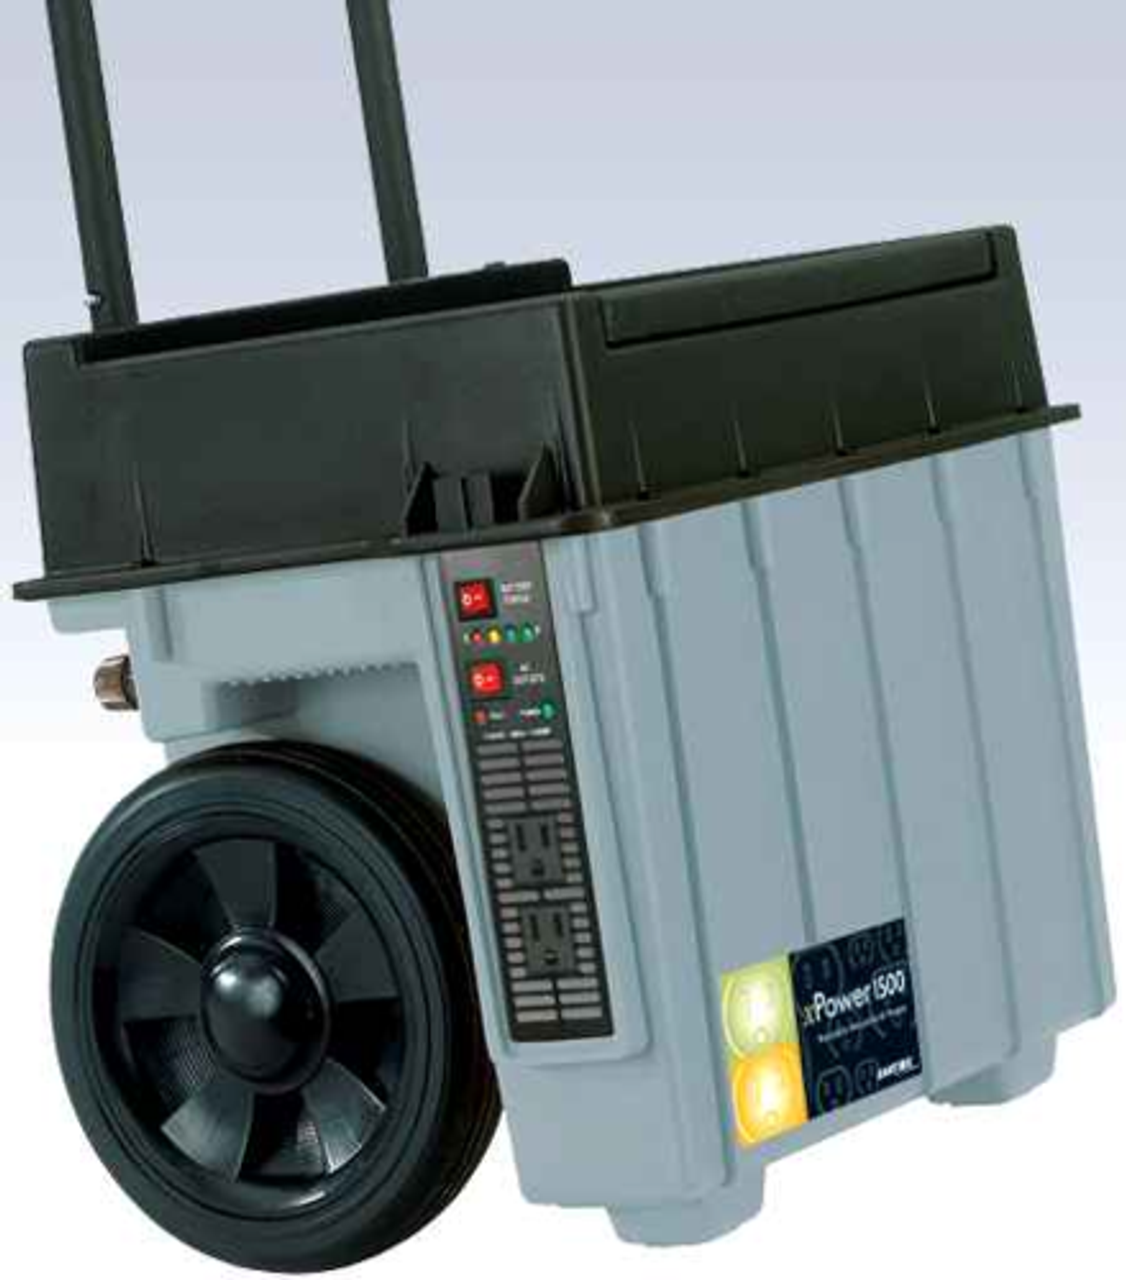 Xantrex XPower Powerpack 802-1500 - Portable Backup Powerpack on